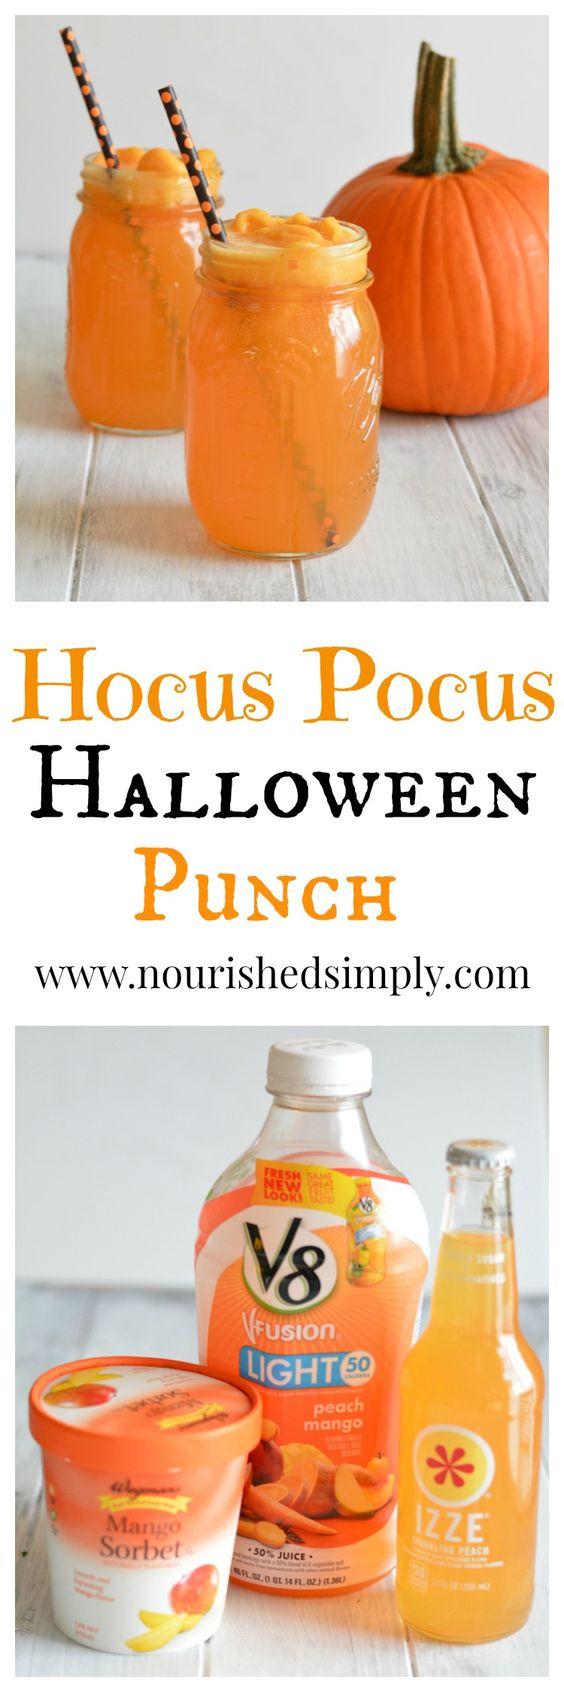 Hocus Pocus Halloween Punch | Recipe | Drinks, Halloween punch and ...